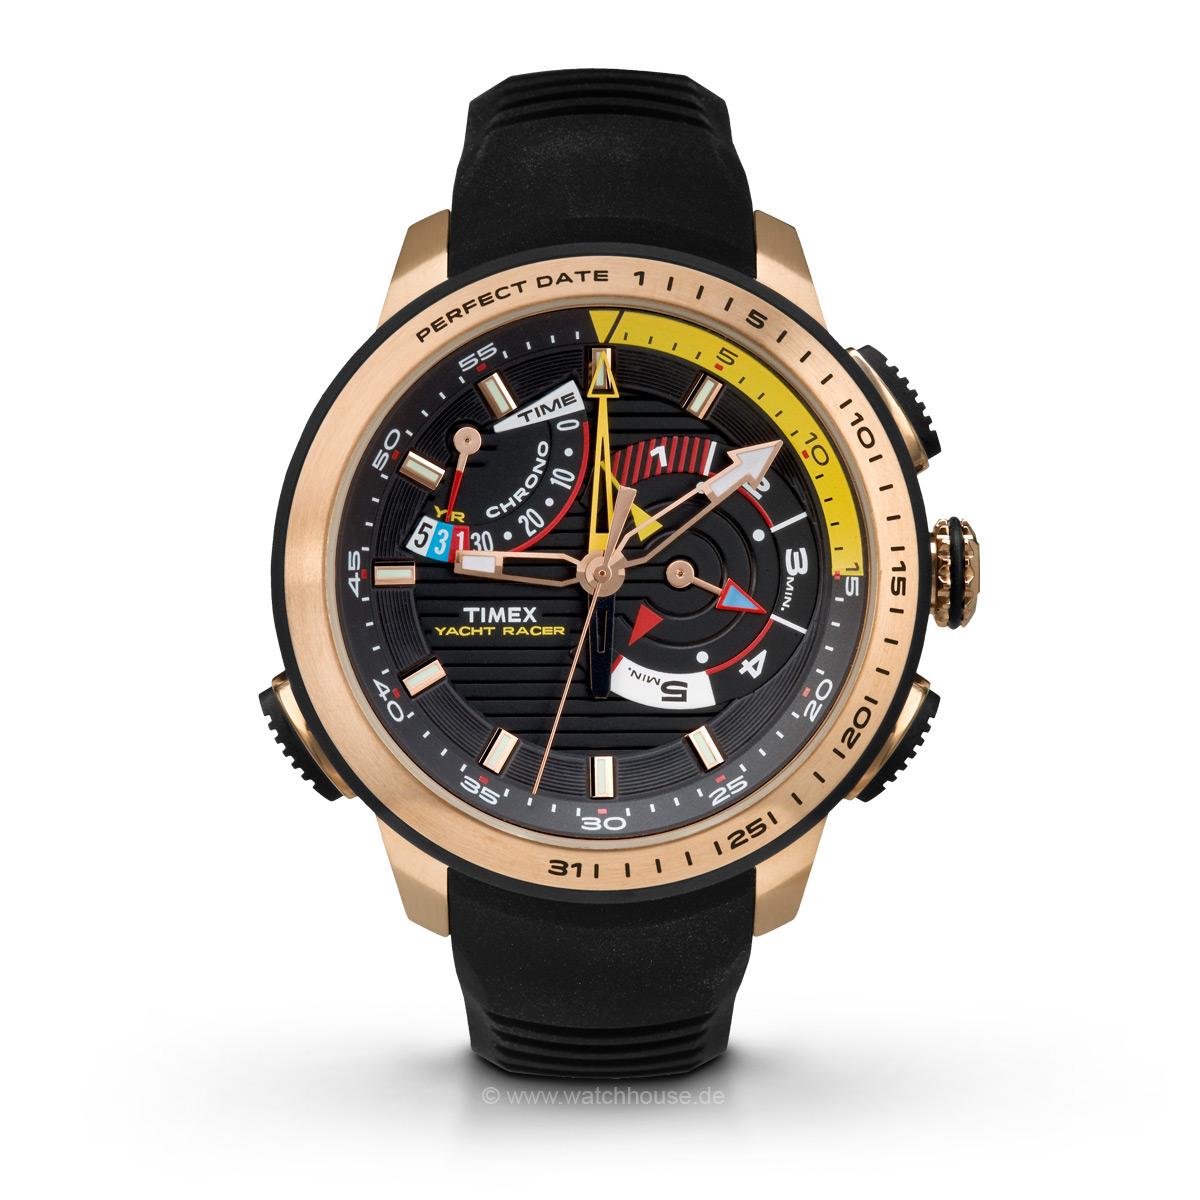 Timex Intelligent Quartz Yacht Racer TW2P44400 Herren Armbanduhr